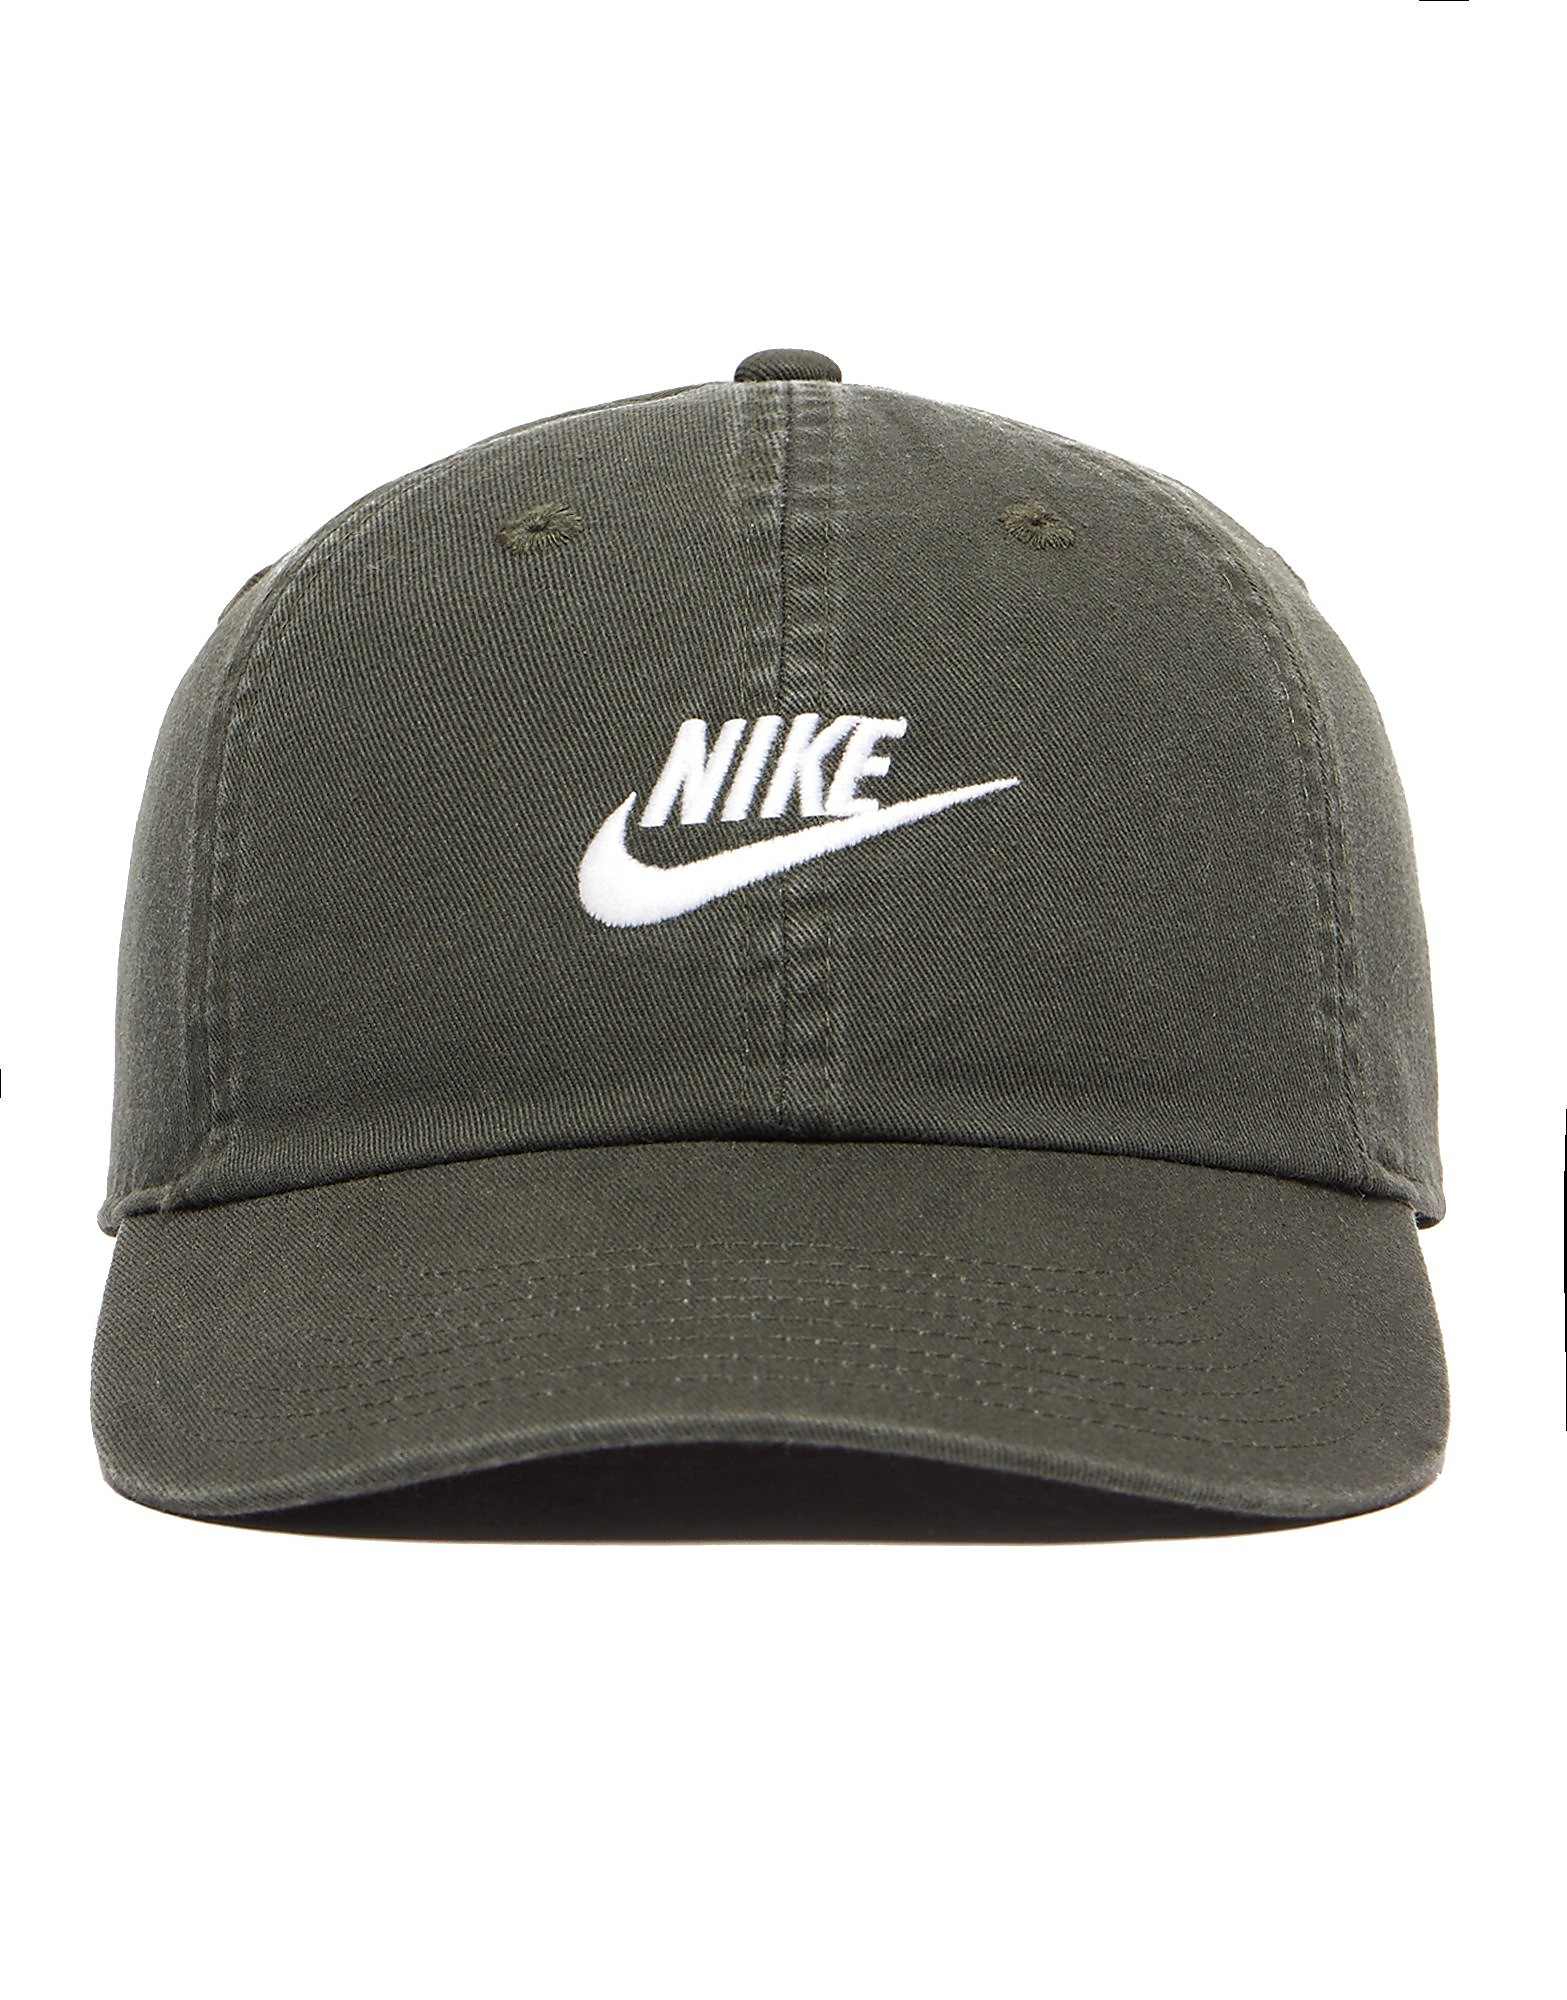 Nike gorra Futura 2 Washed